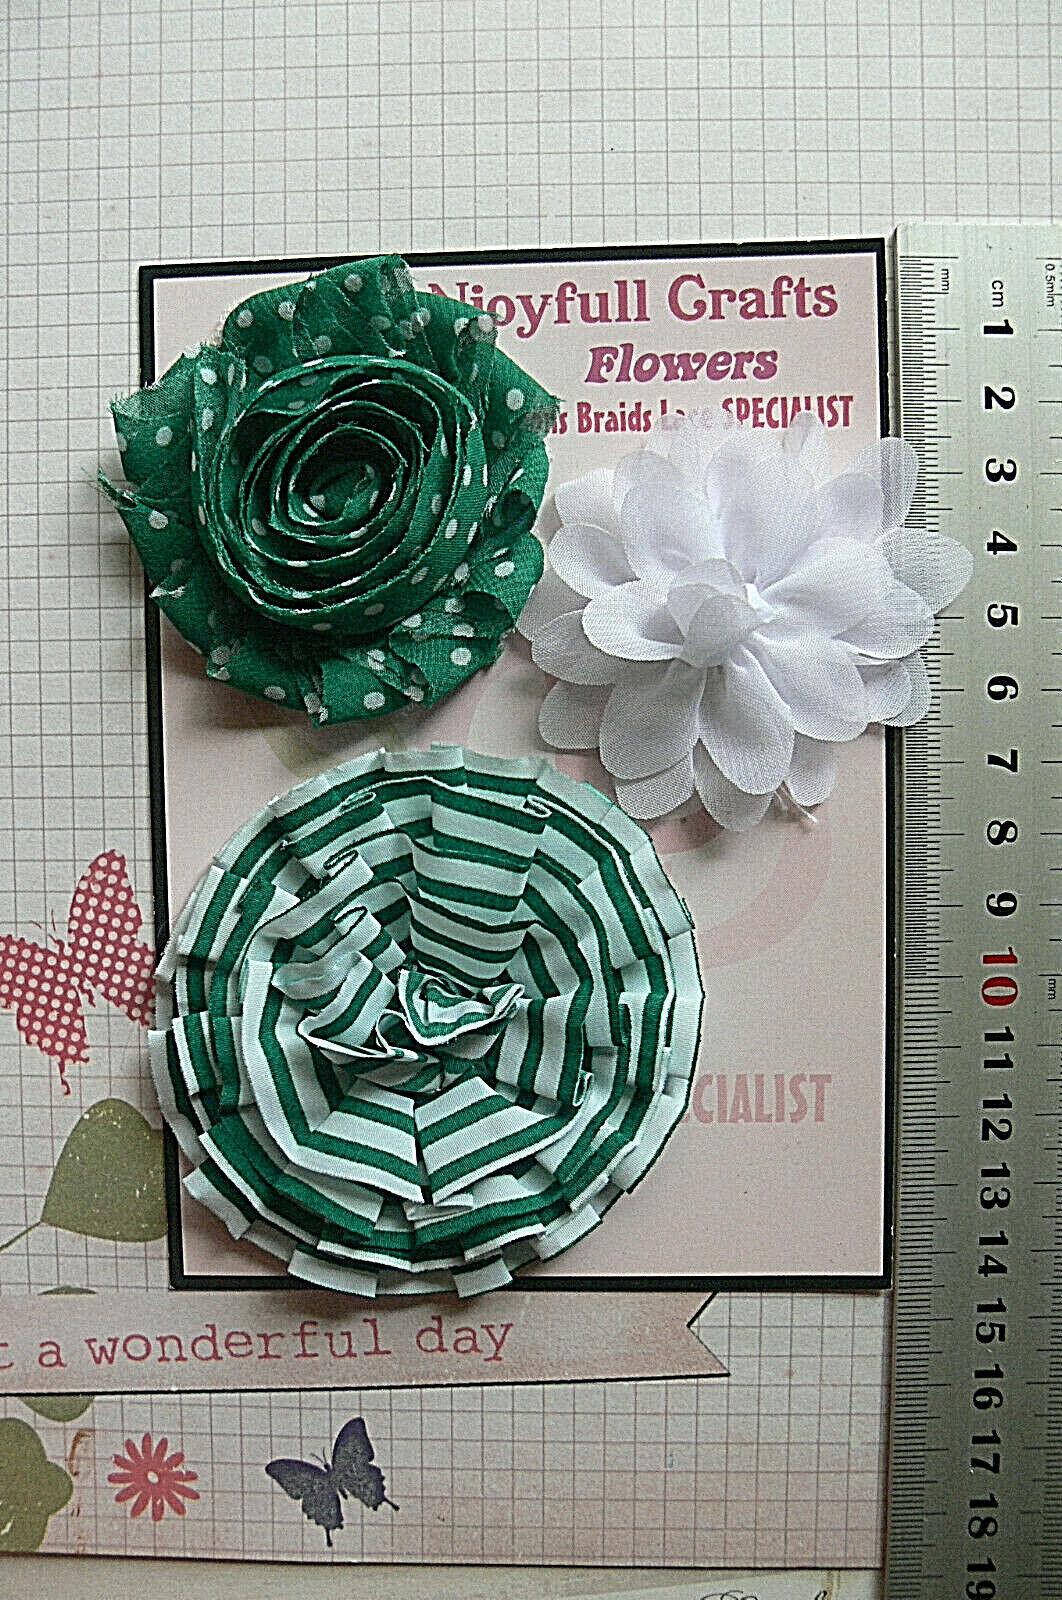 WHITE & GREEN Fabric Organza Cotton - 3 Flower Pk 55-75mm Njoyfull Crafts T1